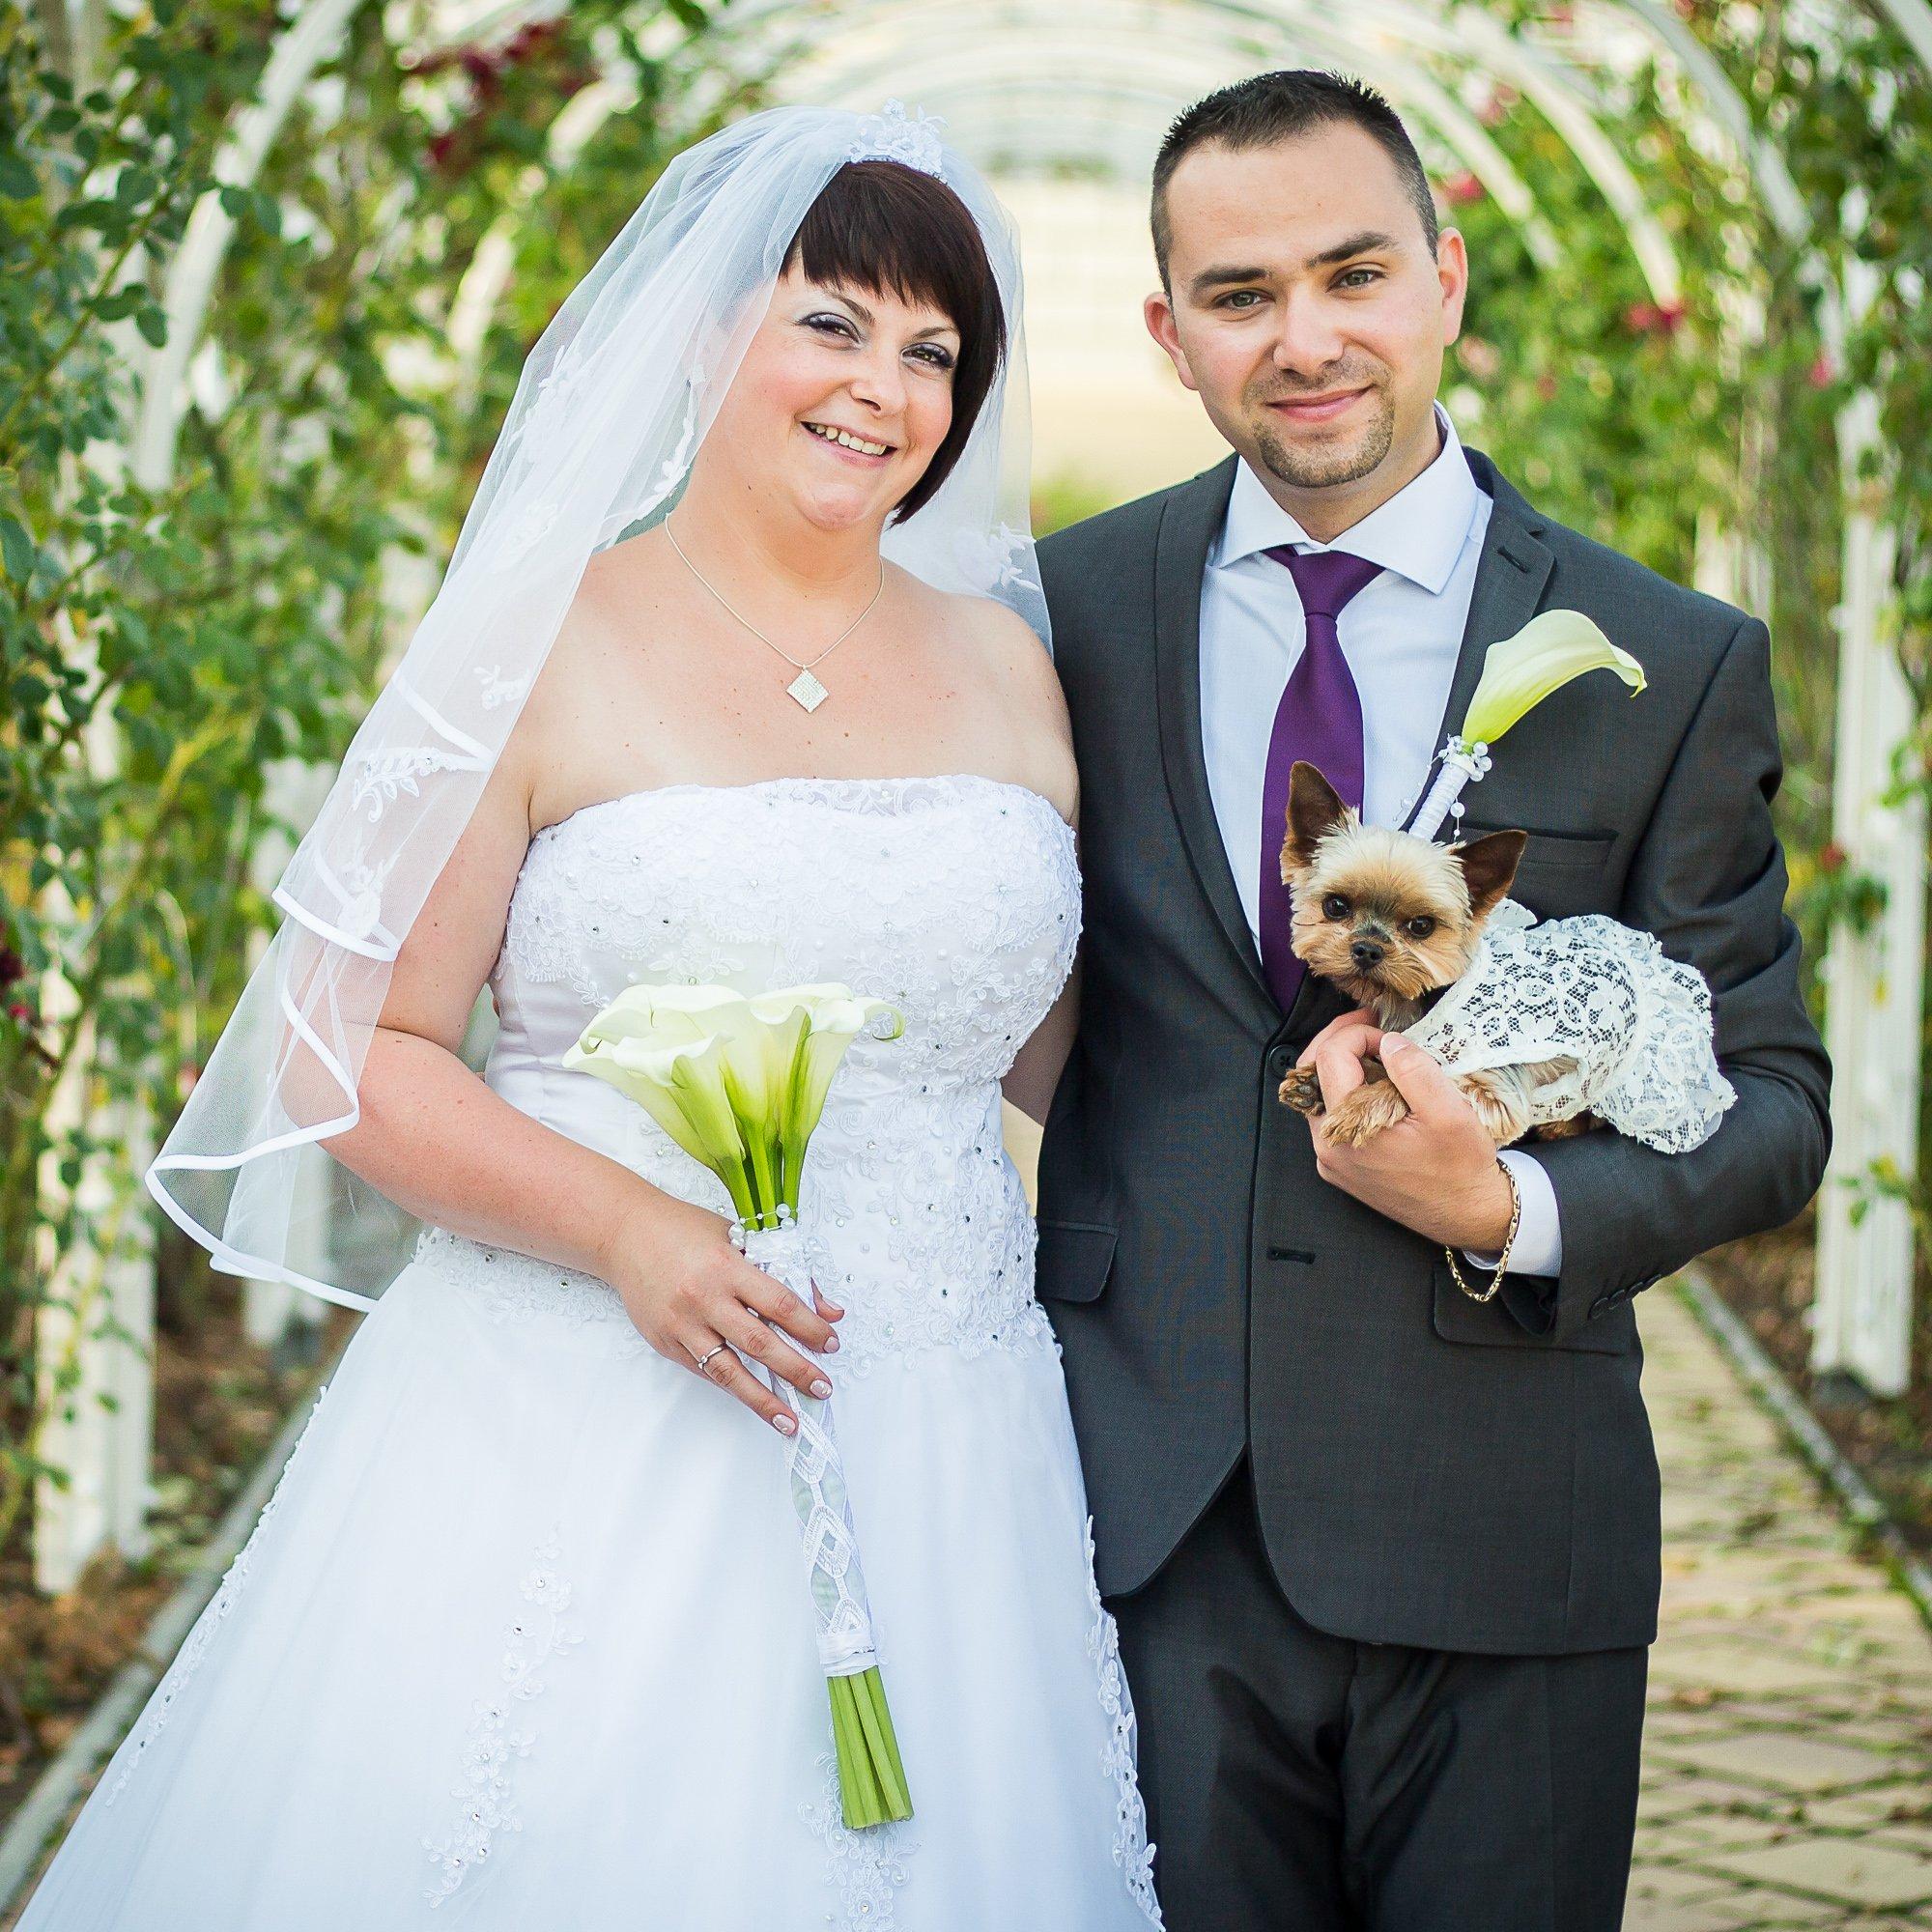 Esküvőfotózás kutyussal